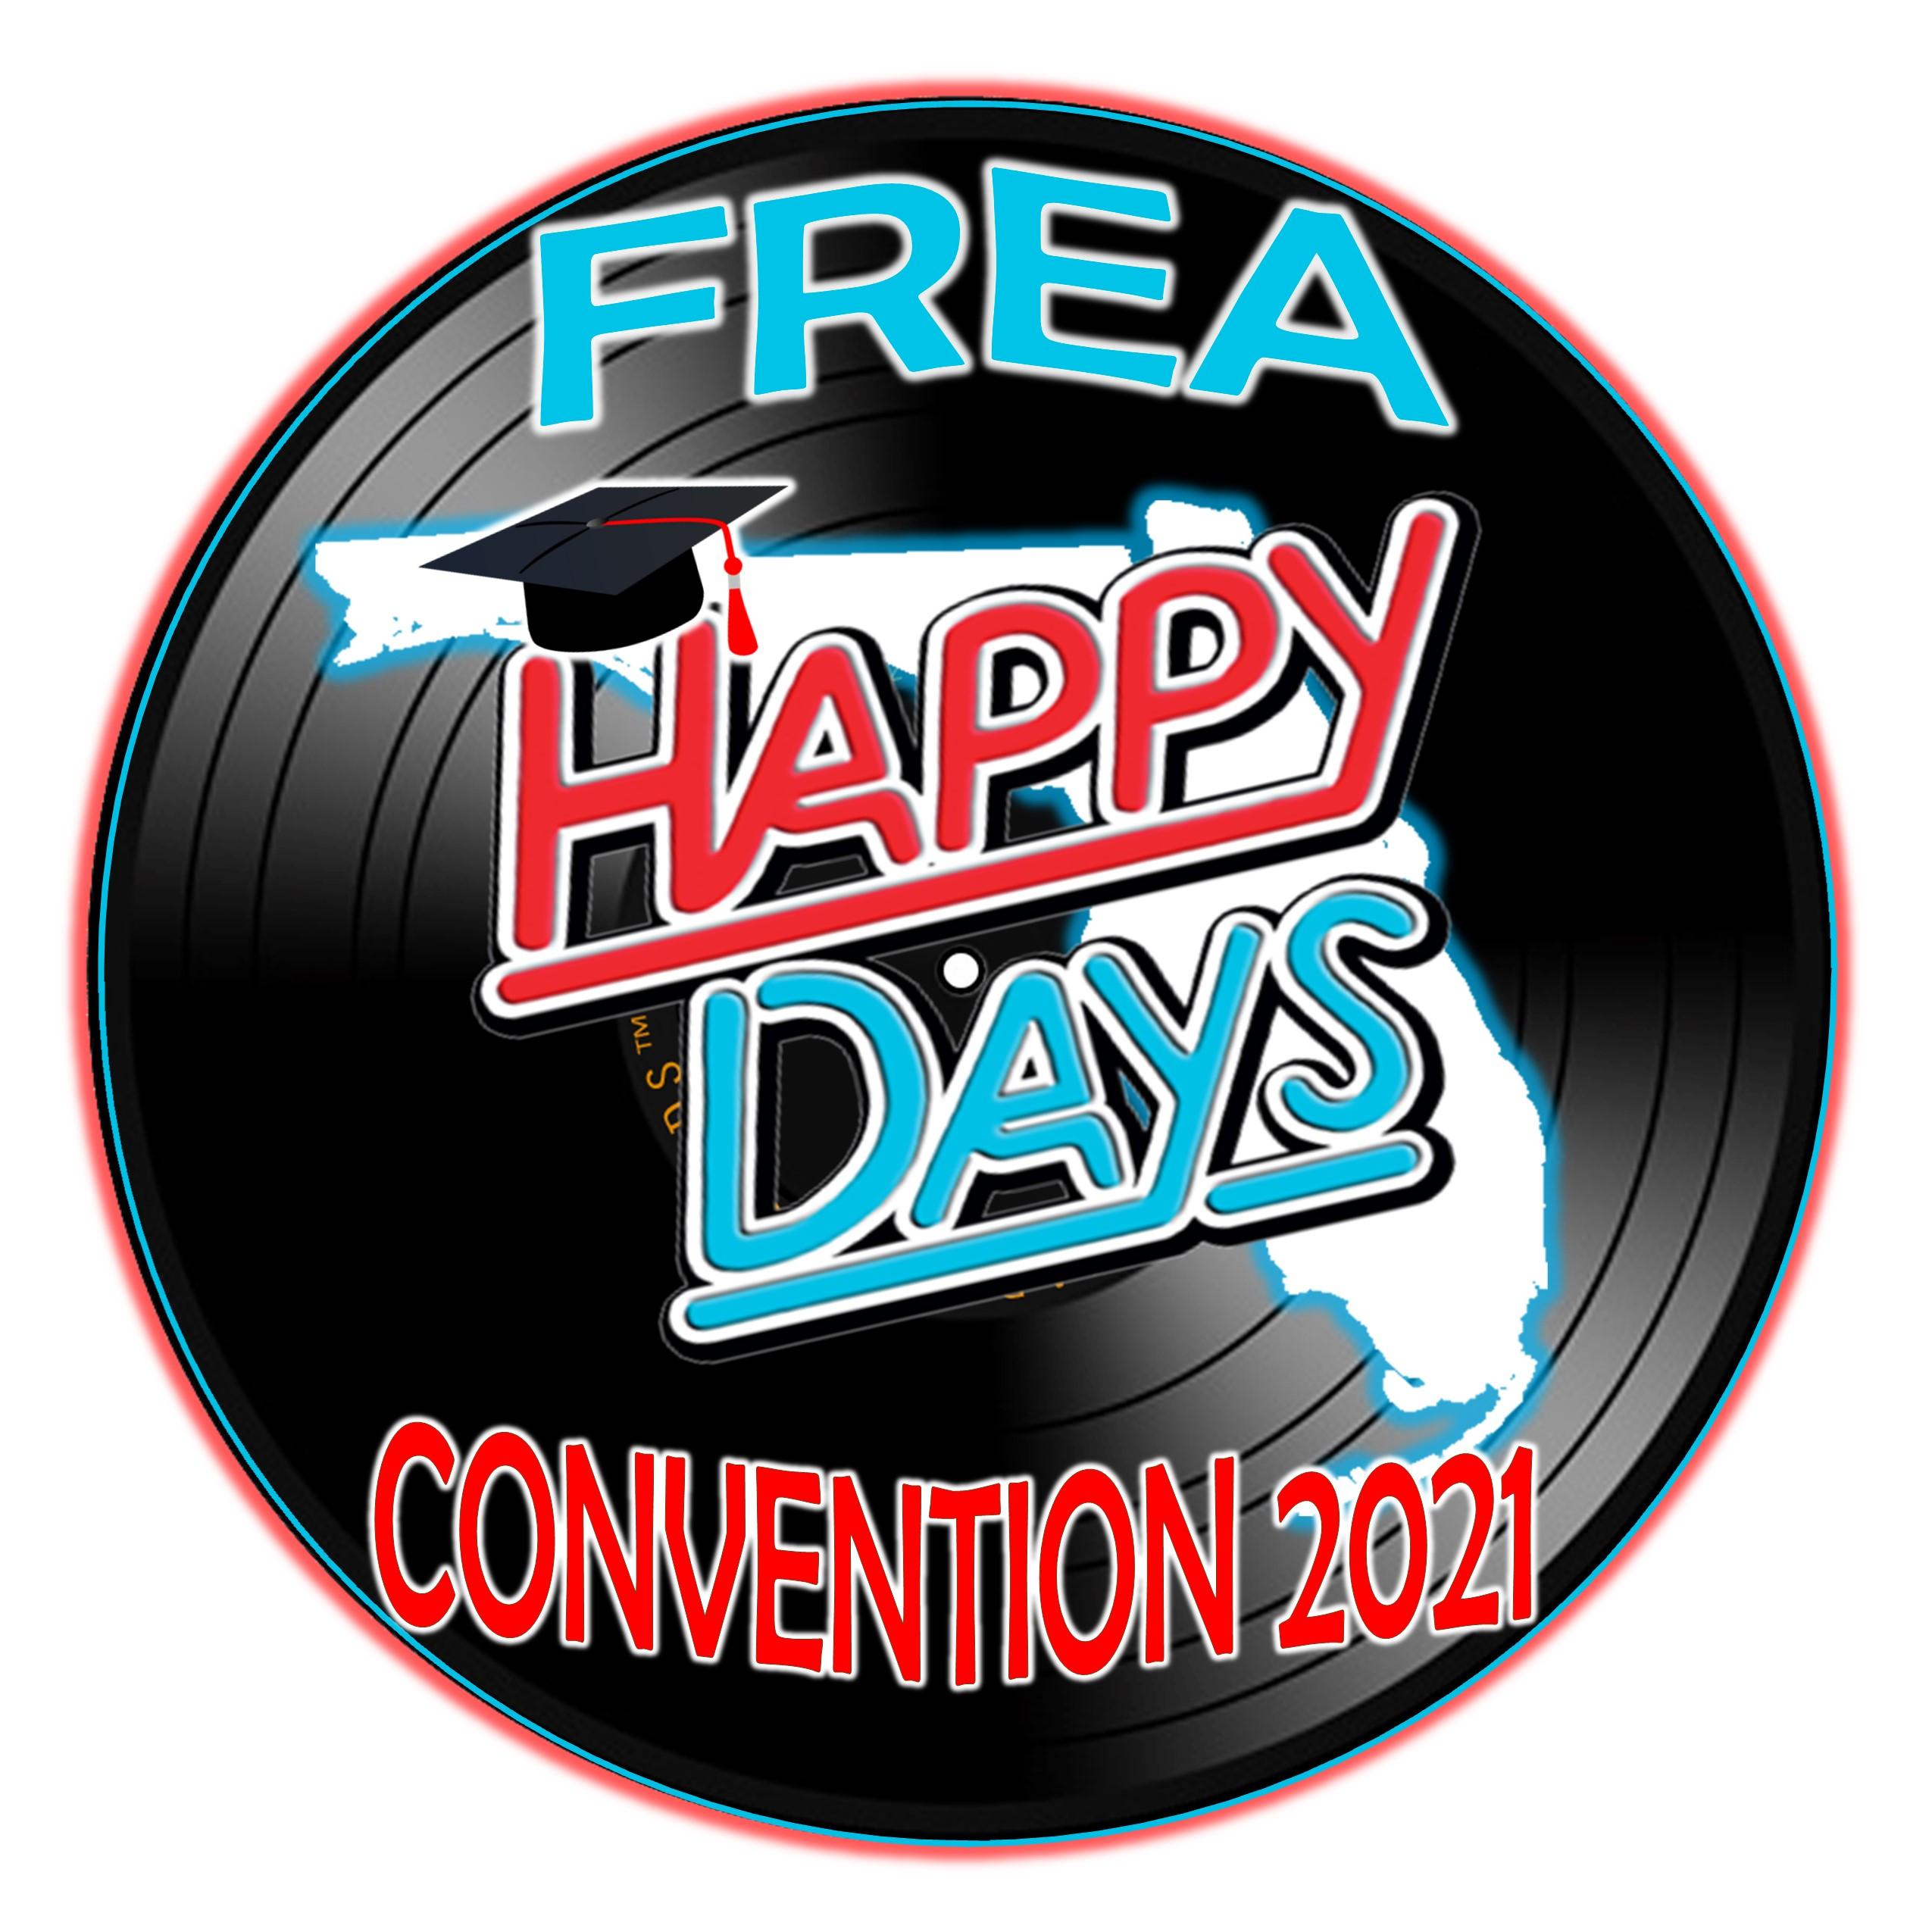 Convention Logo 2021